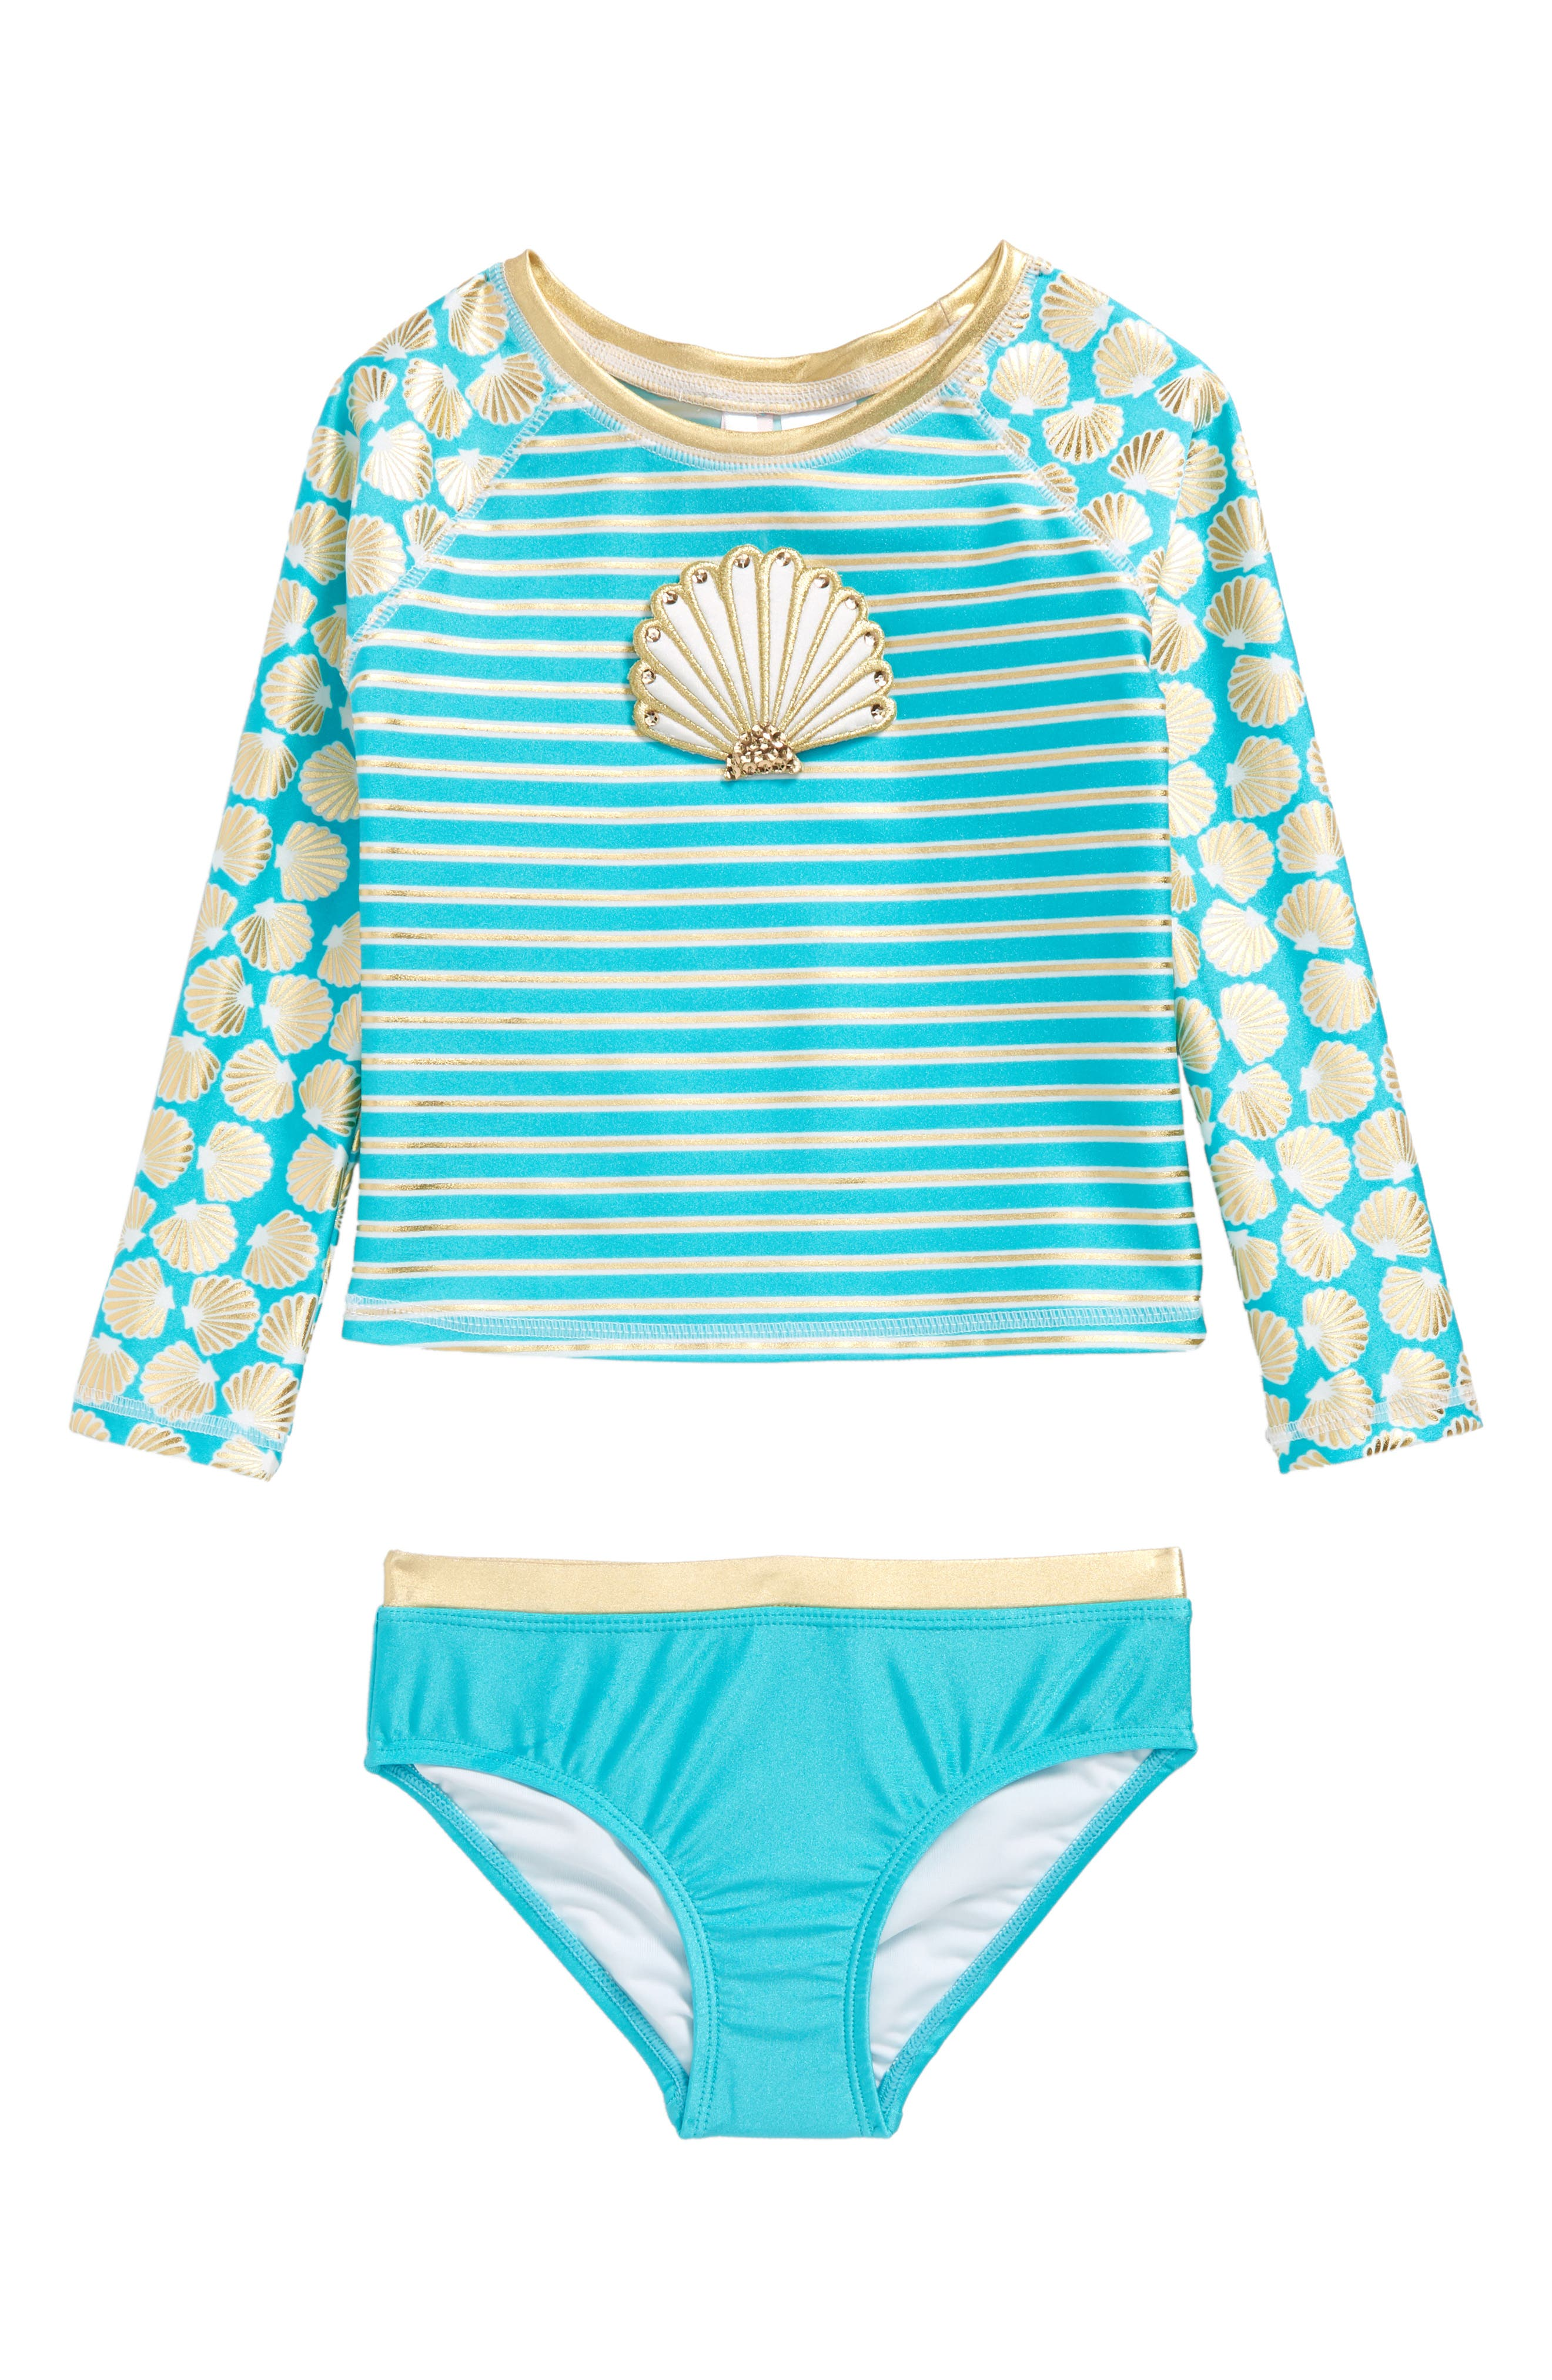 Alternate Image 1 Selected - Love U Lots Seashell Stripe Two-Piece Rashguard Swimsuit (Toddler Girls & Little Girls)